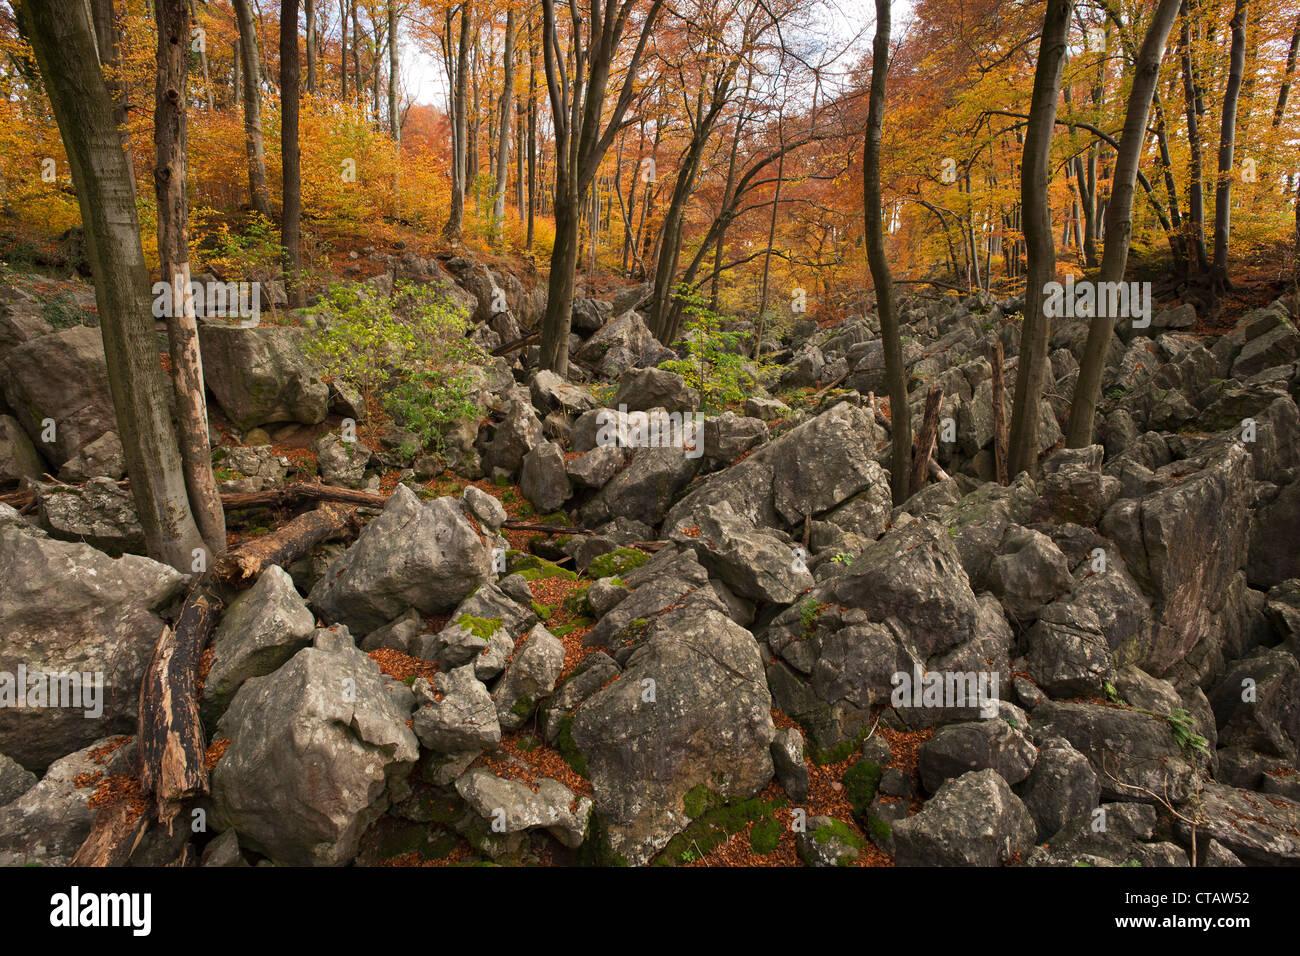 Autumnal forest at nature reserve Felsenmeer, Sauerland, North Rhine-Westphalia, Germany, Europe - Stock Image